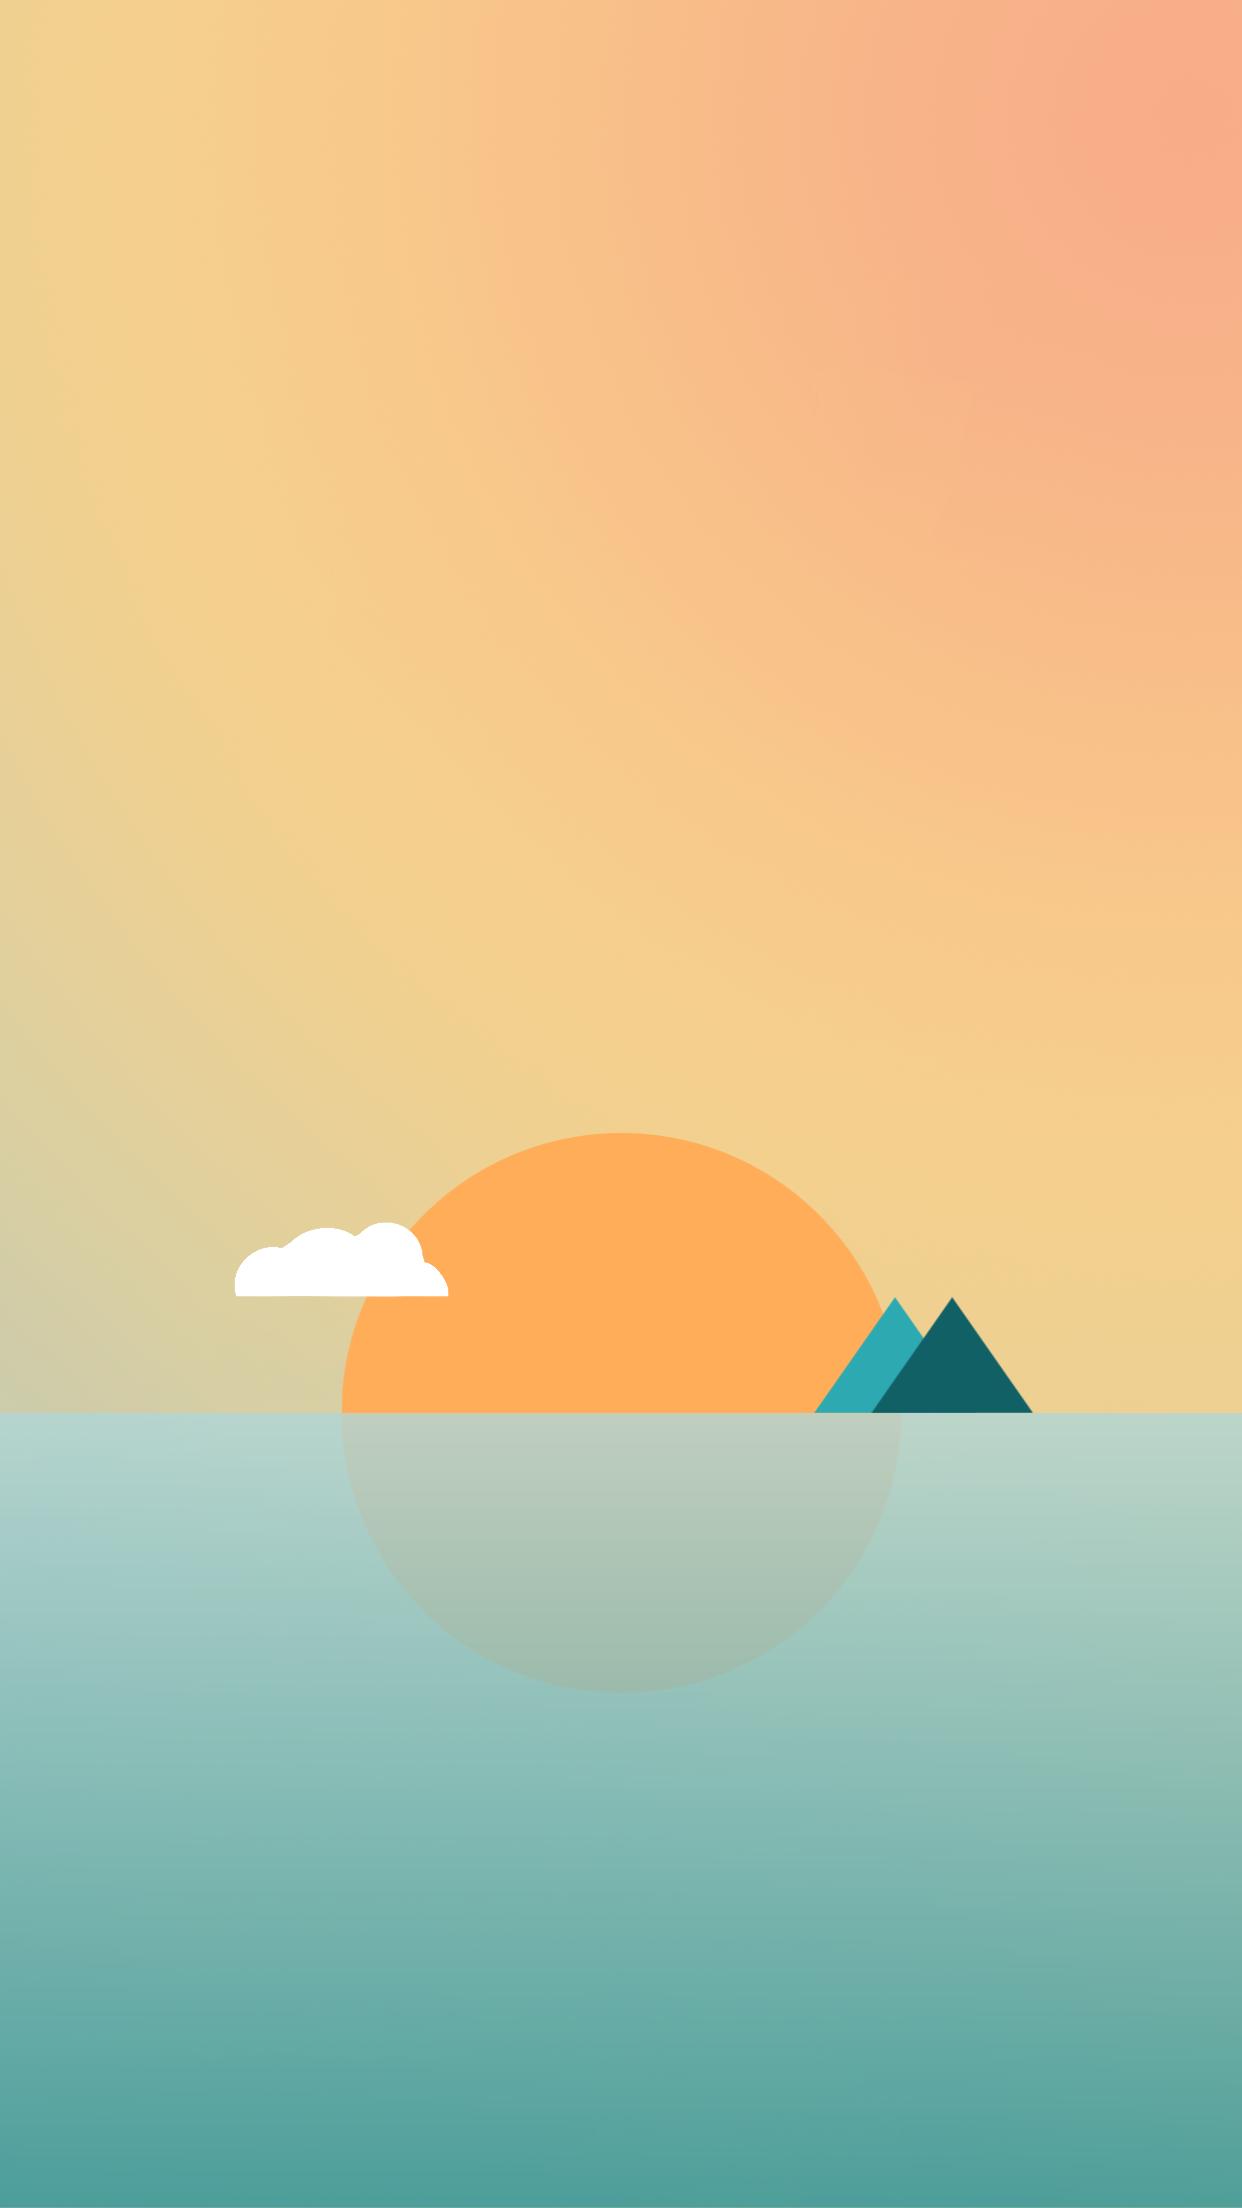 Sweet As Apple Geometry Iphone Wallpaper 035 1 Minimalist Wallpaper Iphone Sun 516691 Hd Wallpaper Backgrounds Download